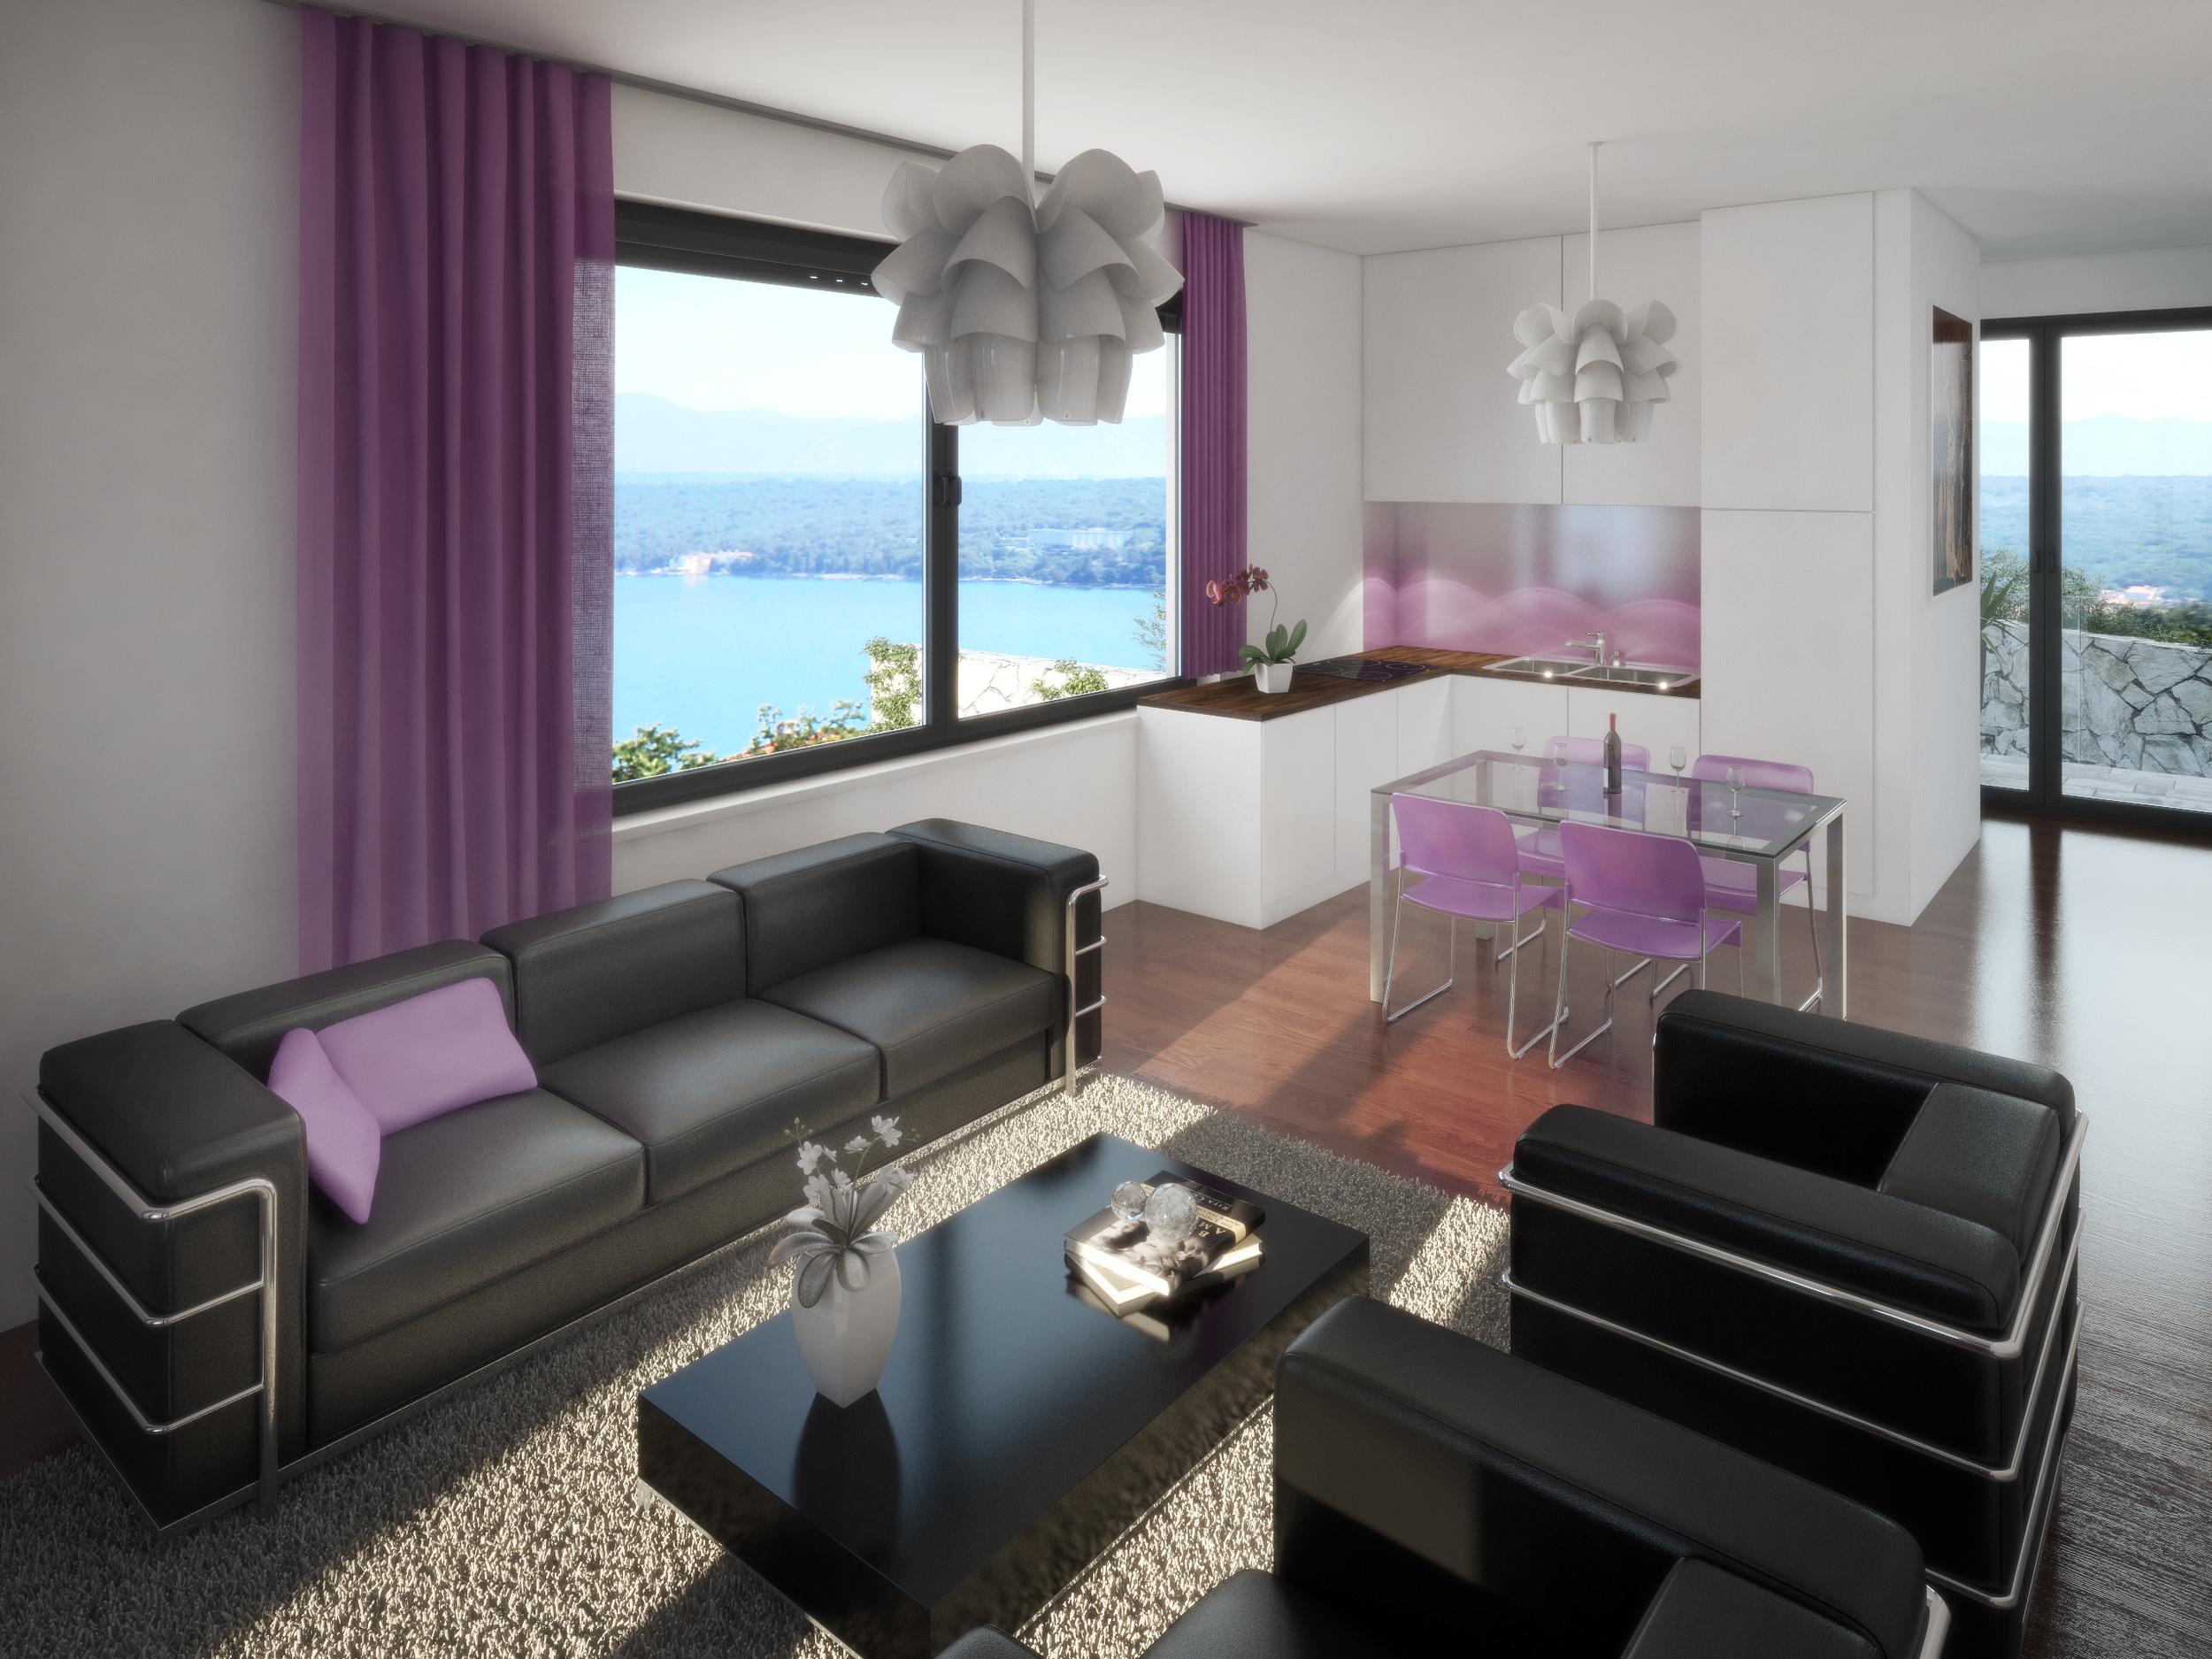 Rova_int_8_1kat_apartman.jpg